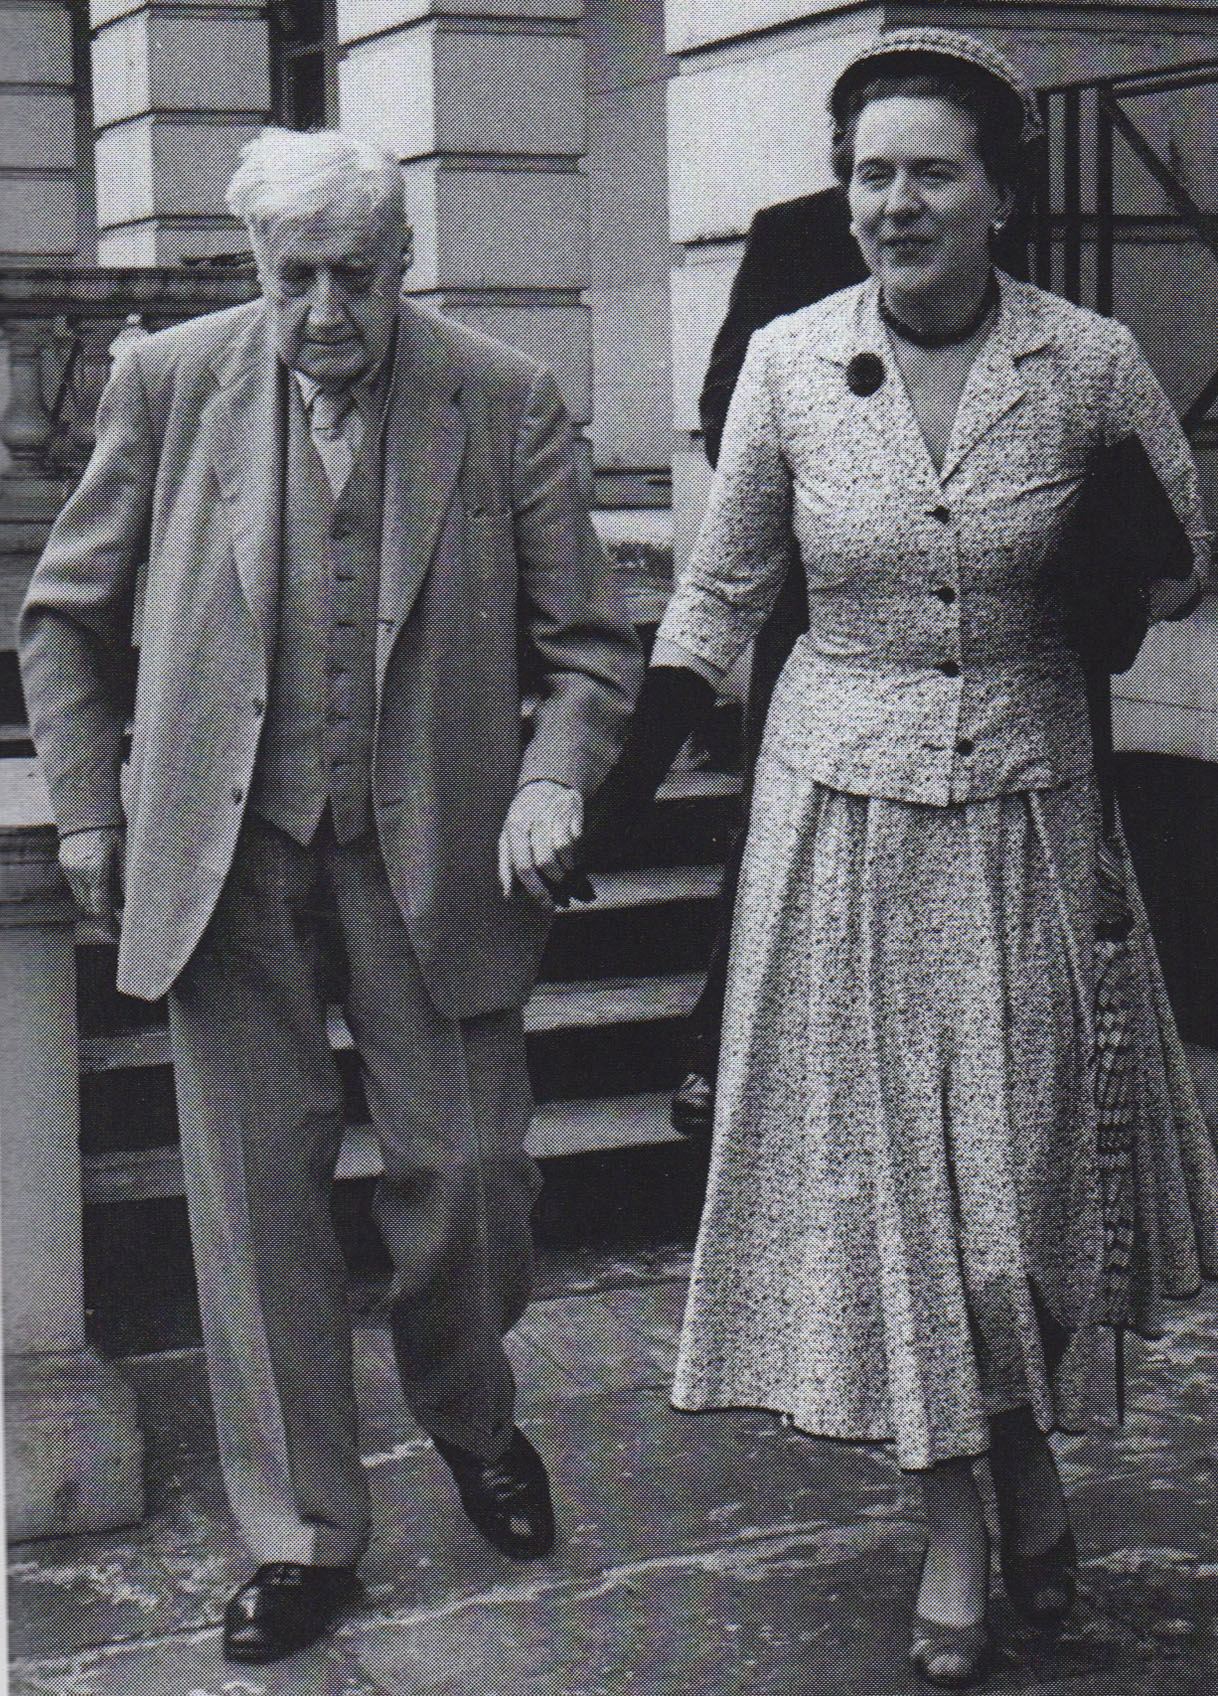 Vaughan Williams and Ursula at Hanover Terrace, London 1957